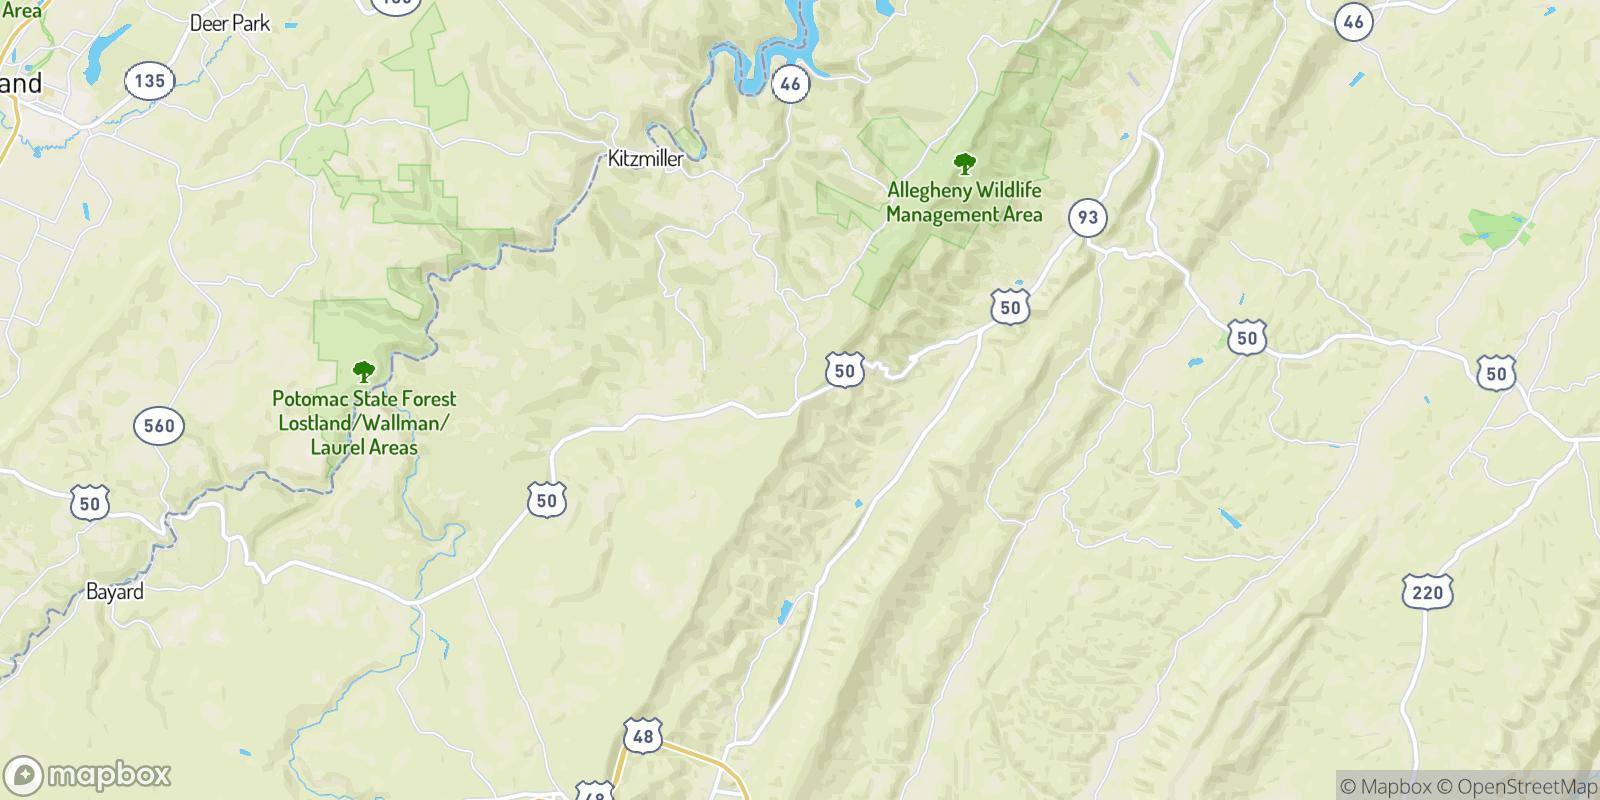 The best camping near Skyline, West Virginia